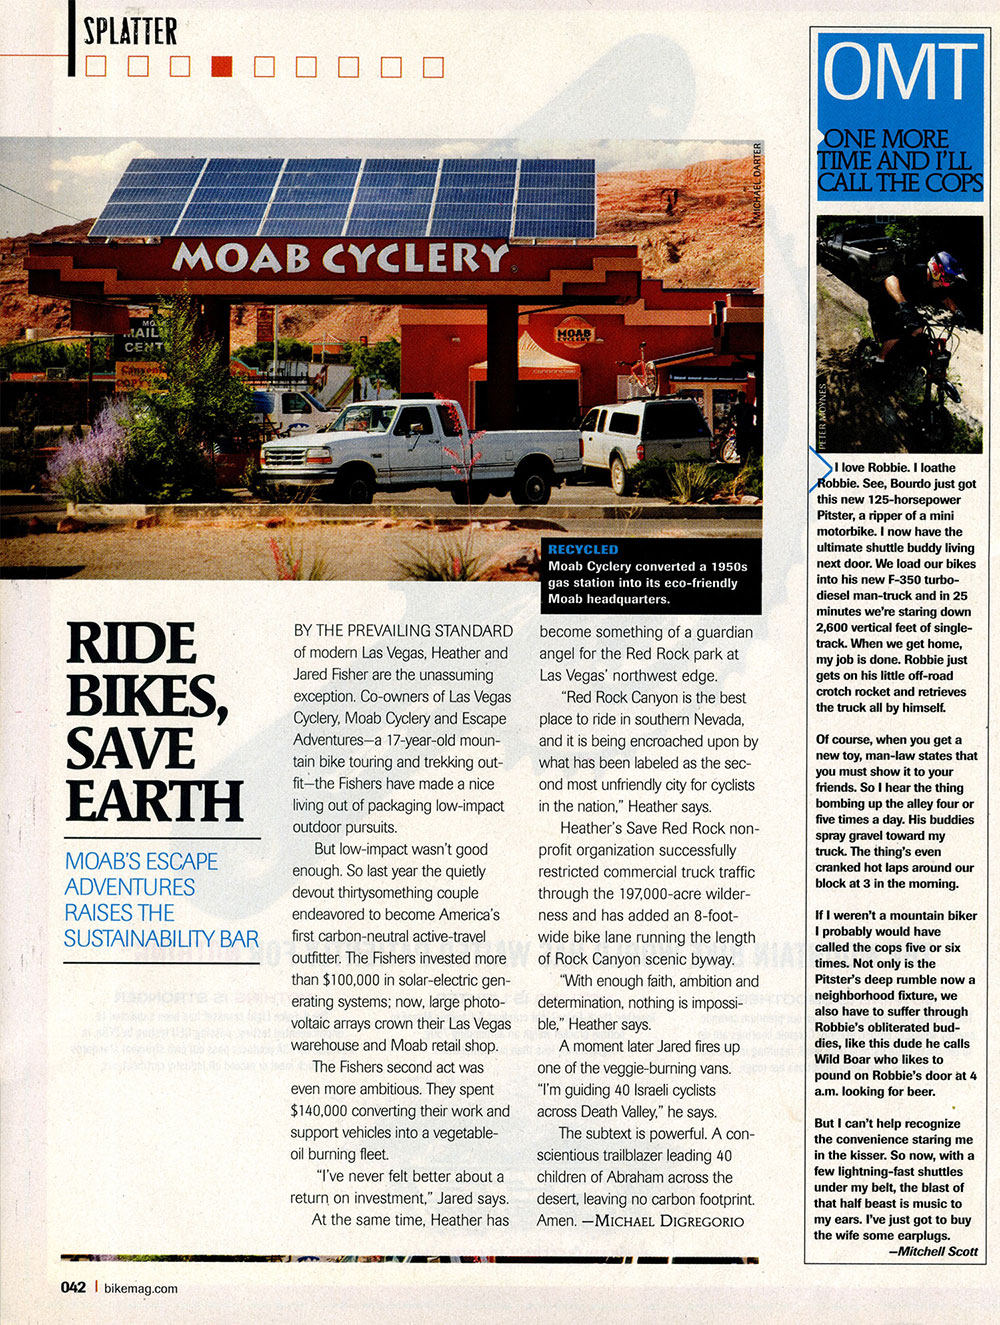 MichaelDiGregorio_ride_bikes_save_earth